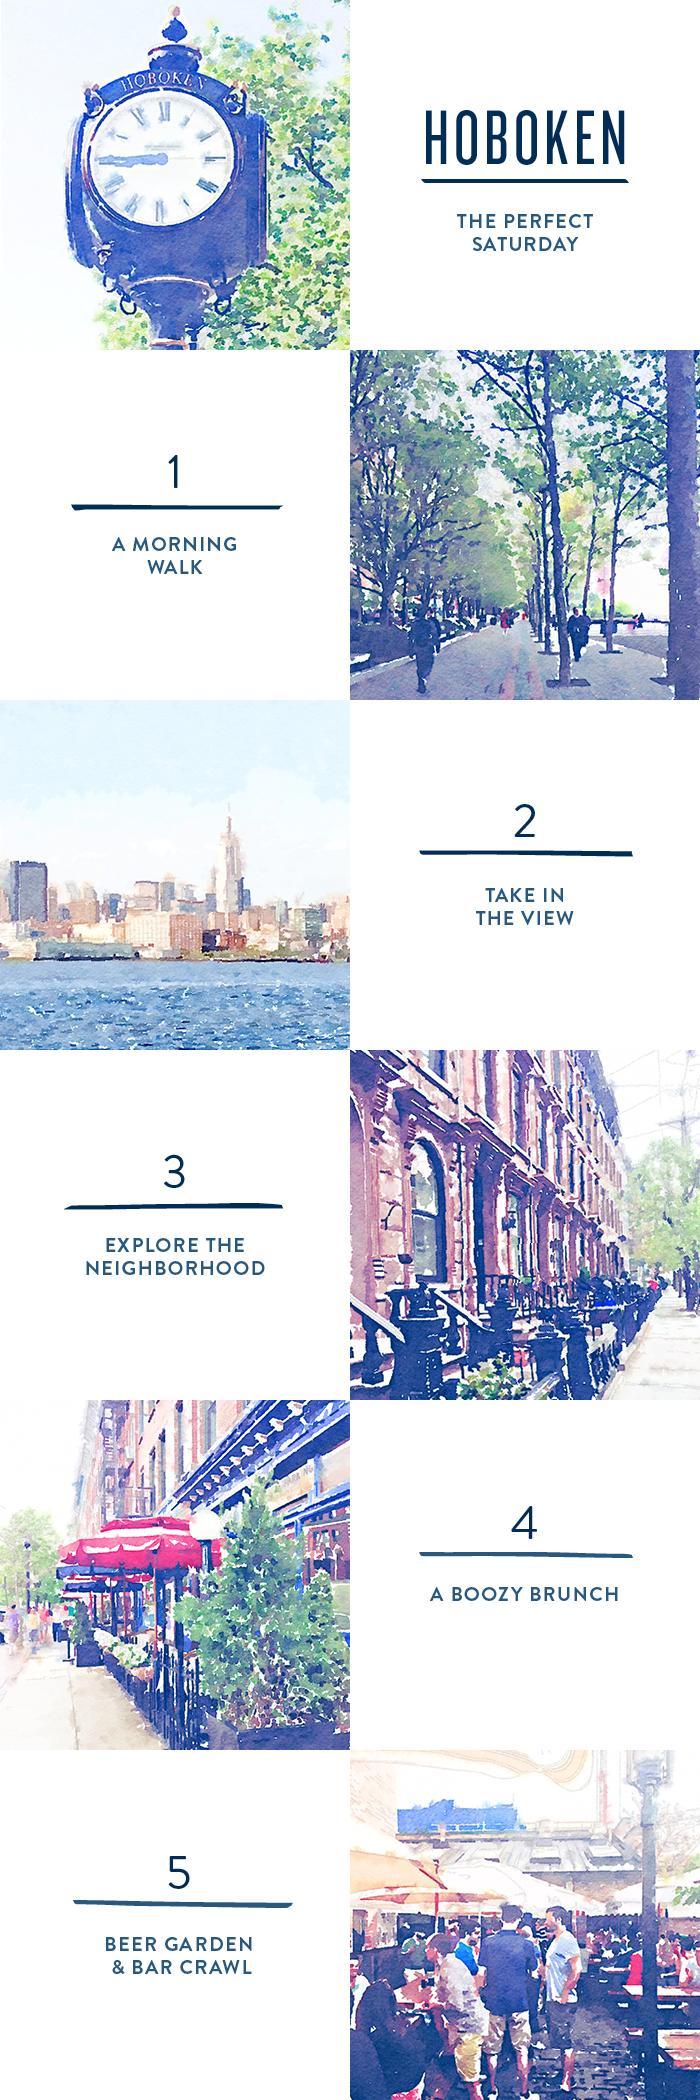 ThePerfectSaturday_Hoboken.jpg